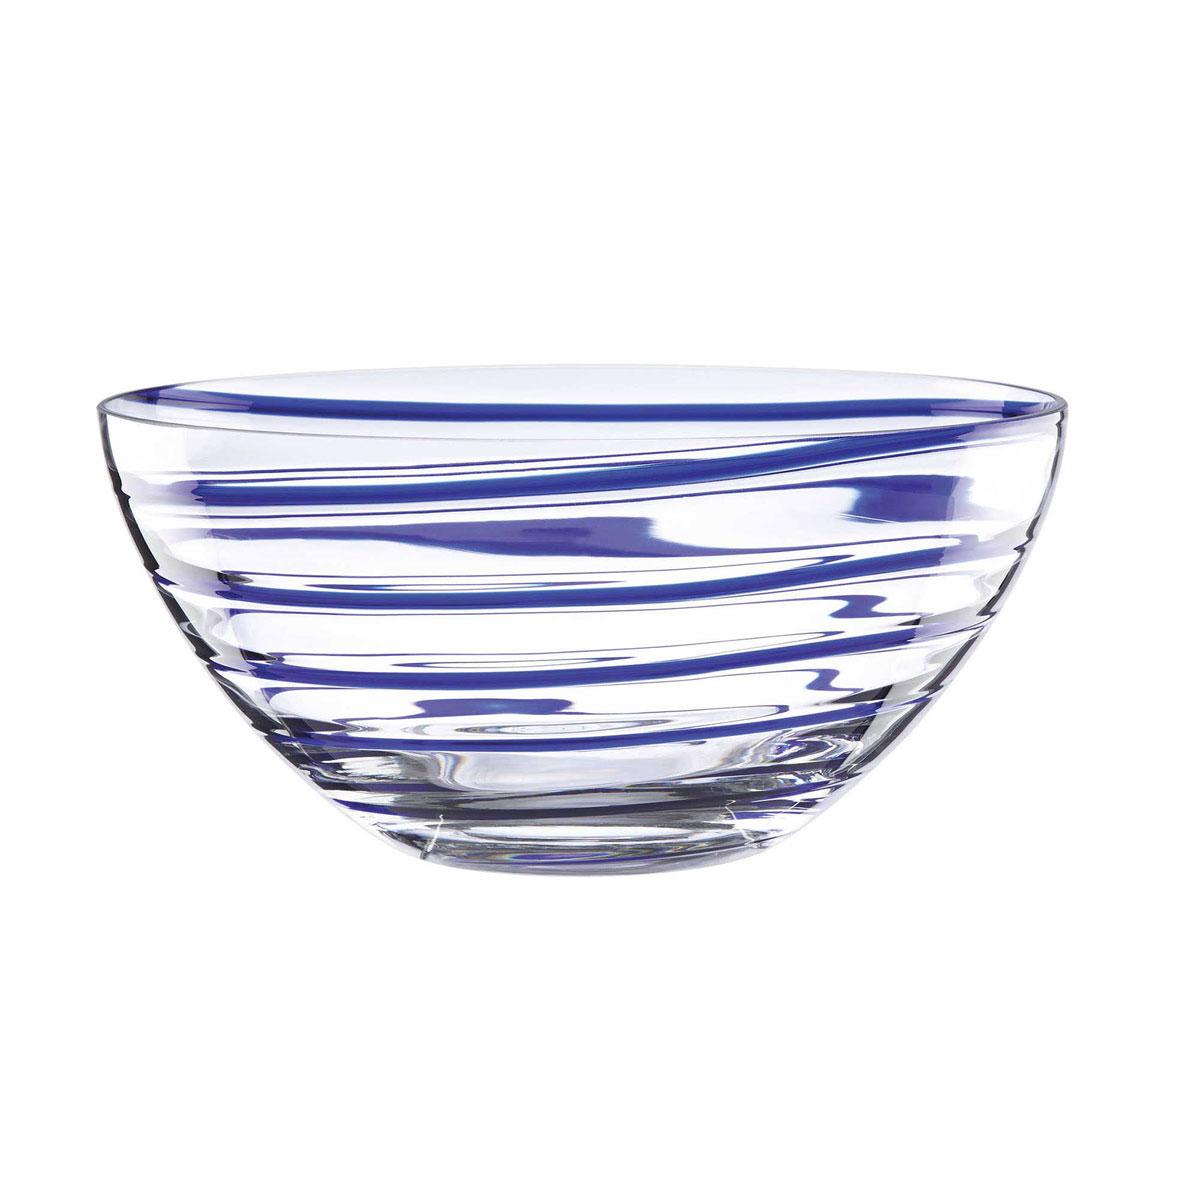 Lenox kate spade, Charlotte Street Crystal Centerpiece Crystal Bowl